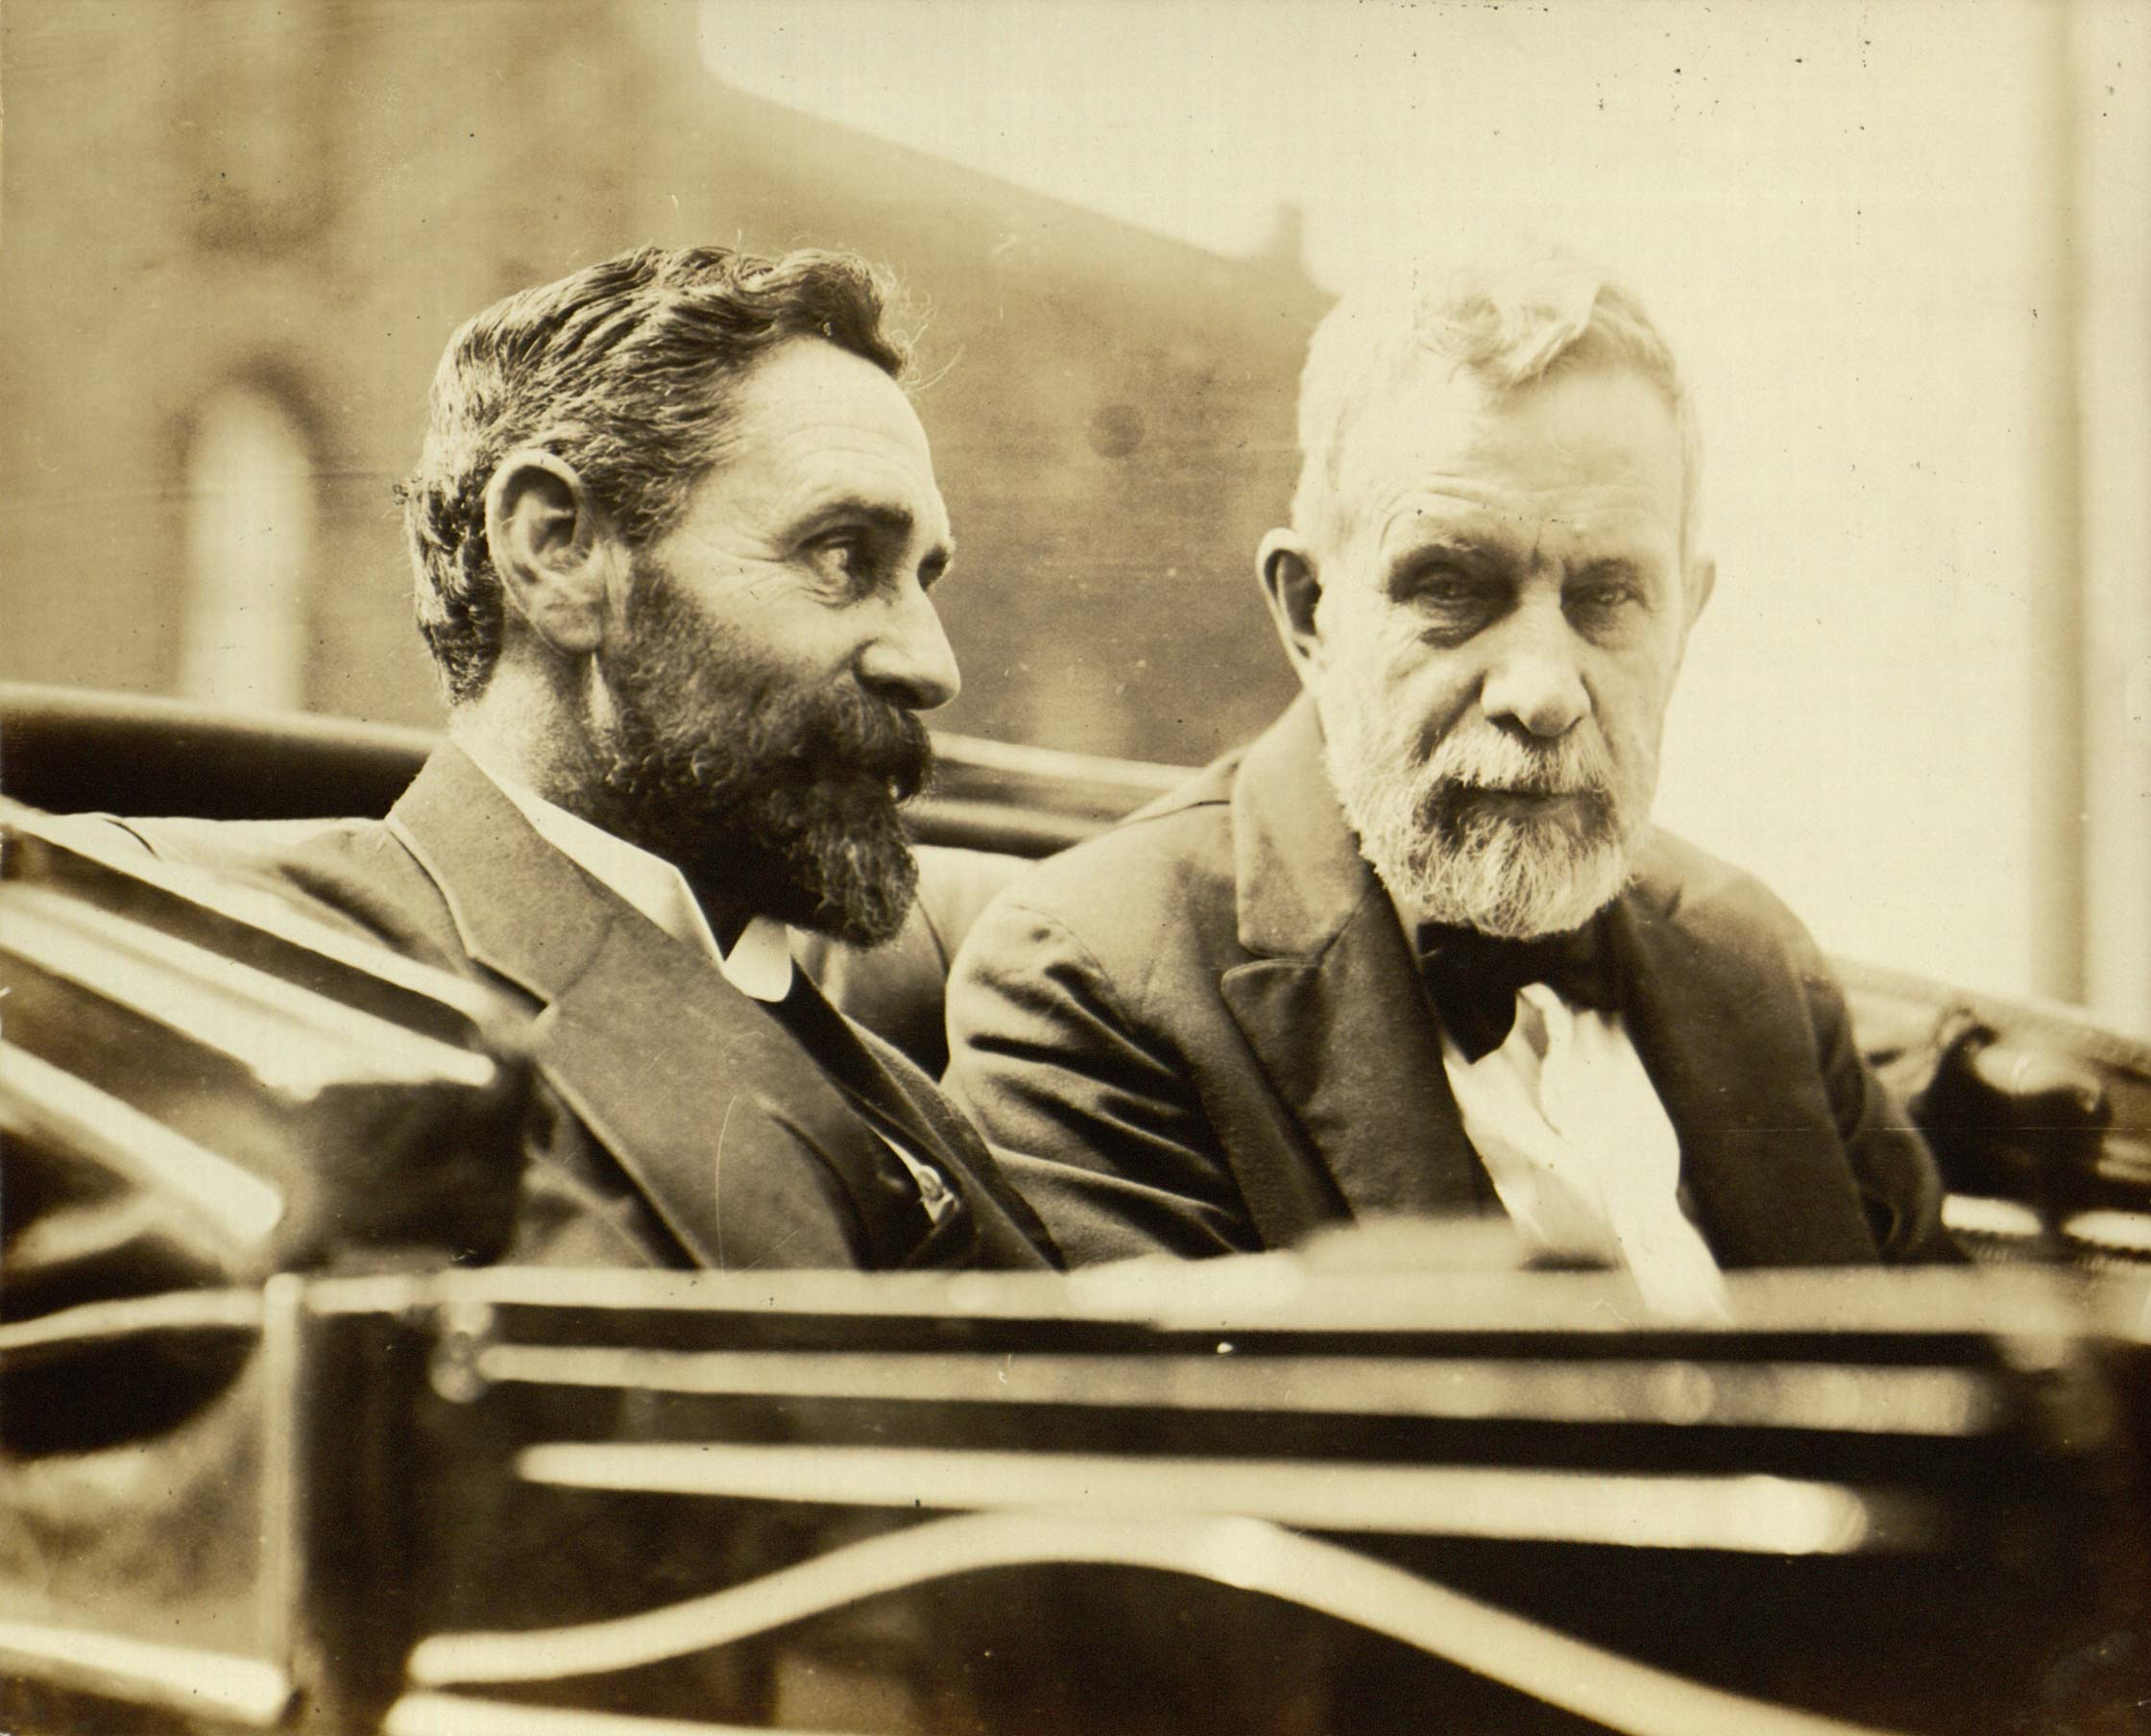 Roger Casement (left) with Clan na Gael leader John Devoy (right).